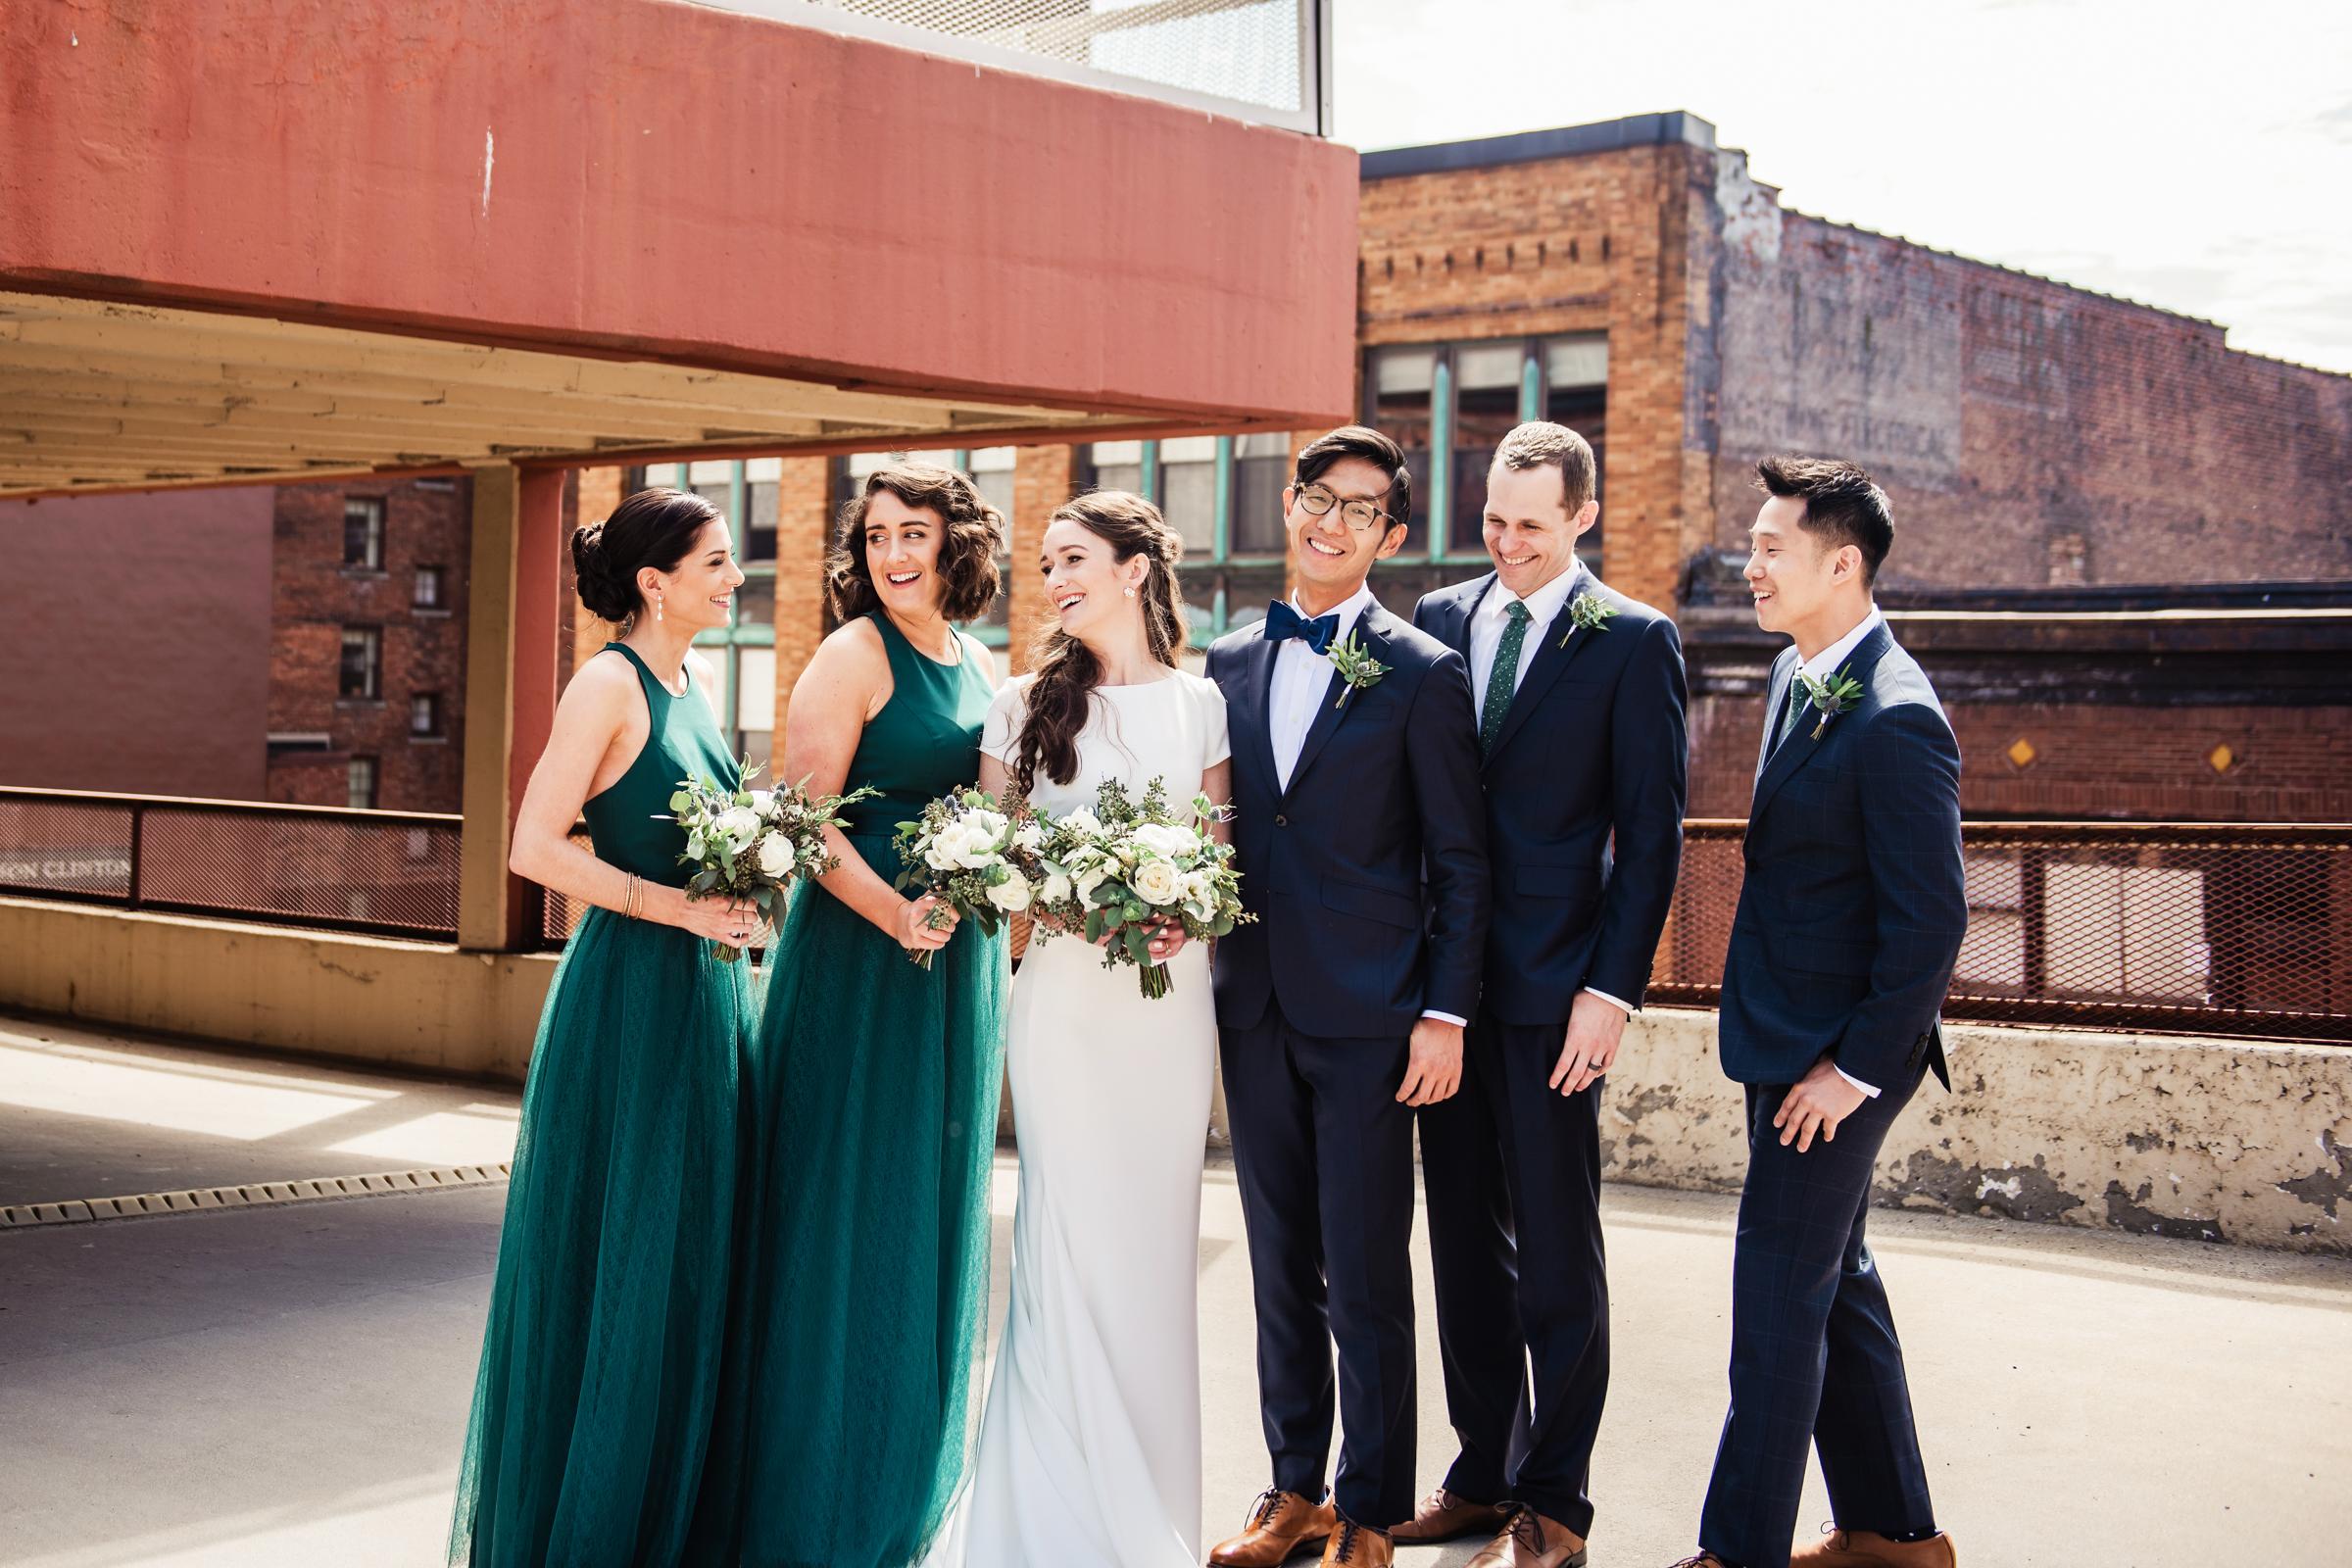 SKY_Armory_Syracuse_Wedding_JILL_STUDIO_Rochester_NY_Photographer_DSC_5504.jpg